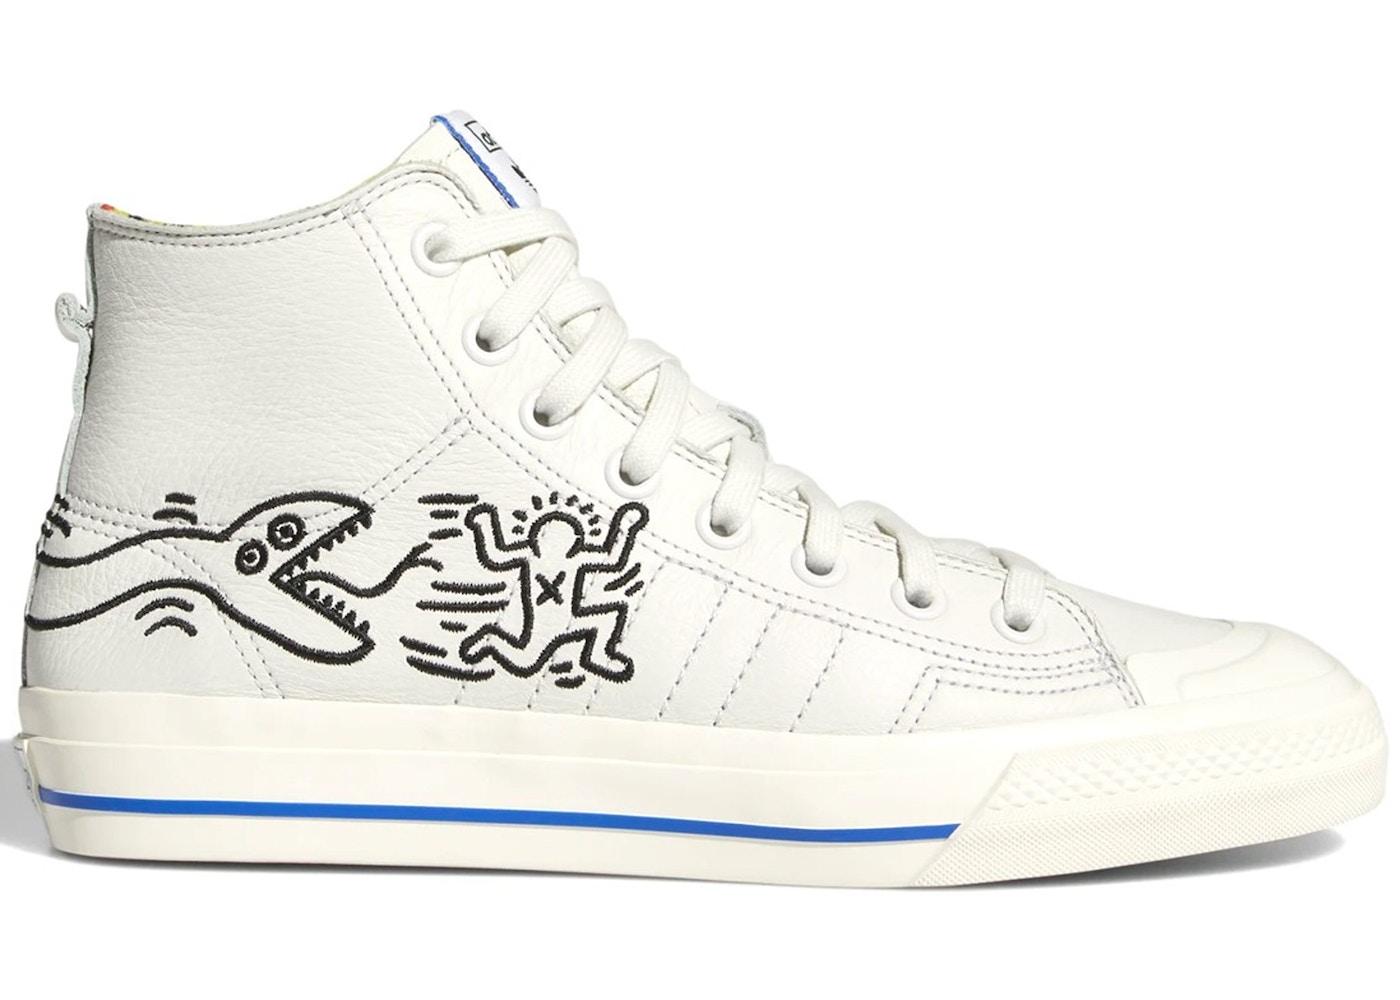 meilleur pas cher d6409 0f789 adidas Nizza Hi Keith Haring